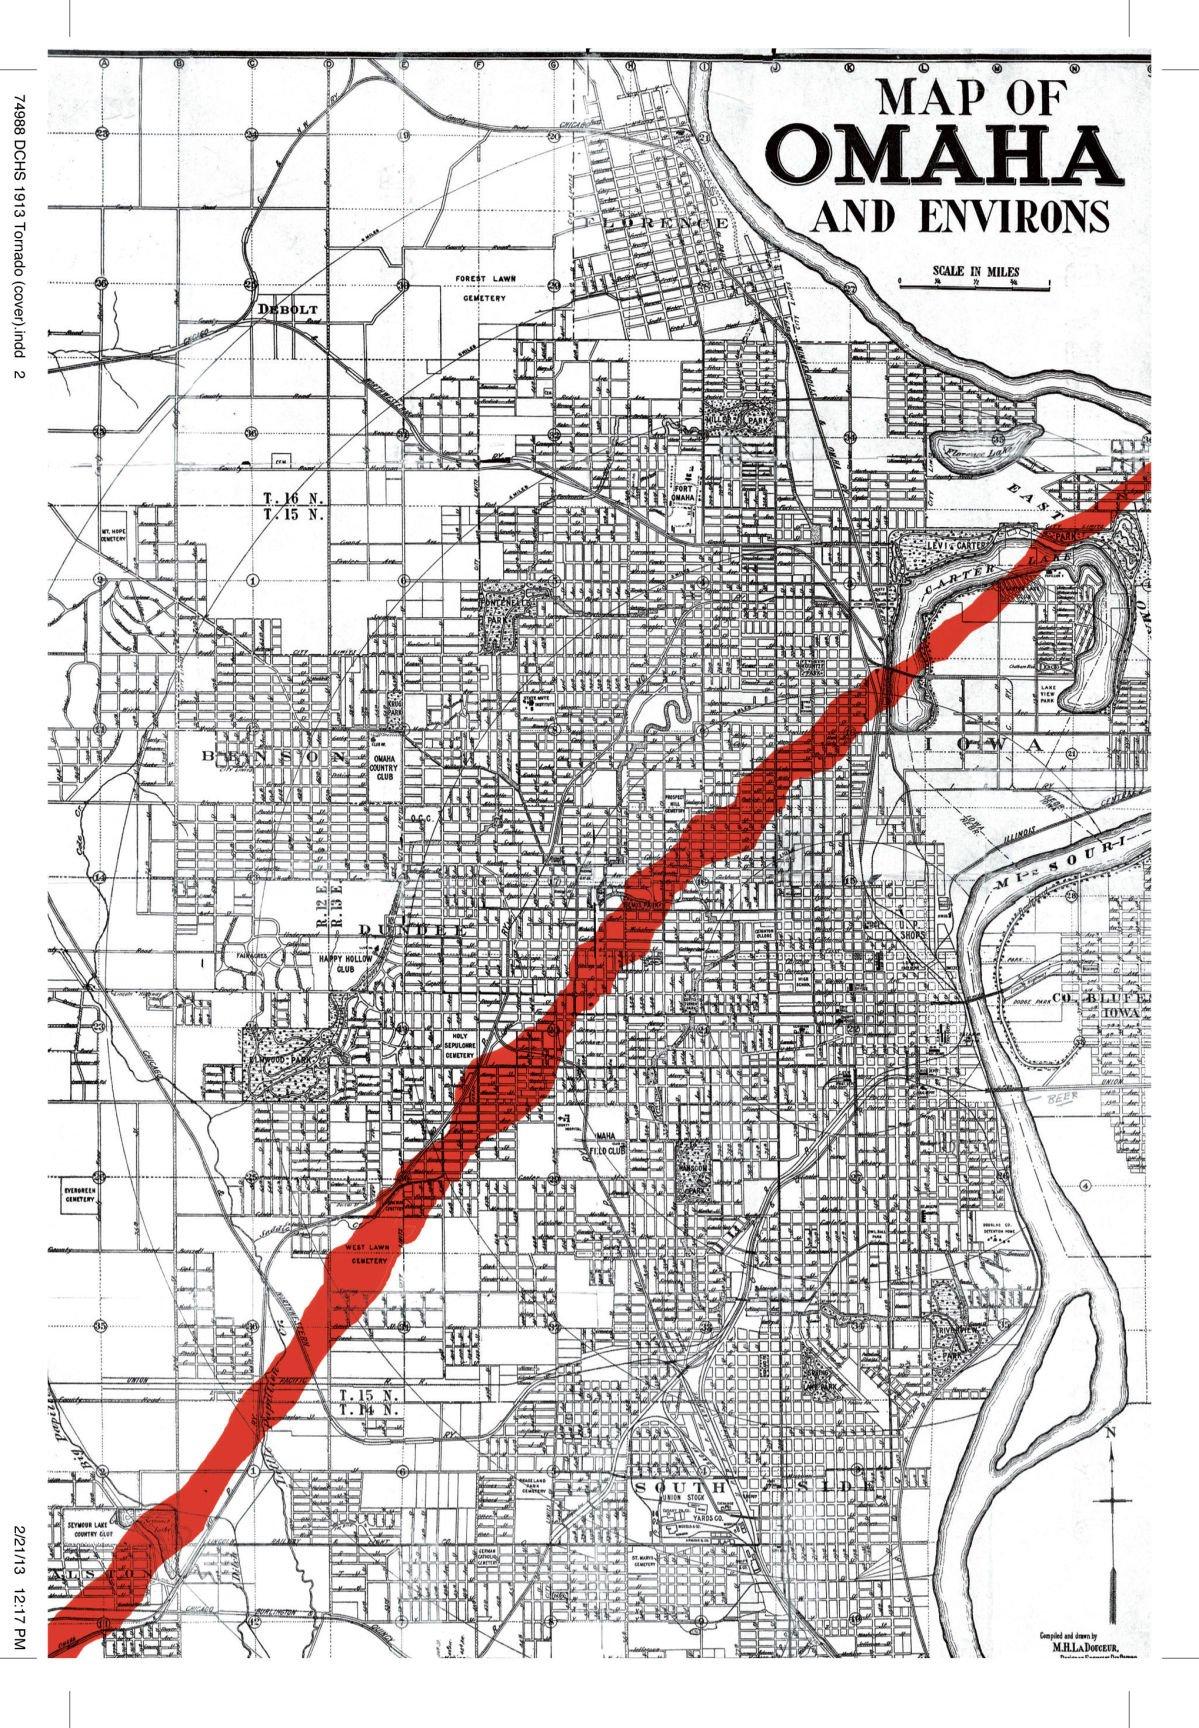 March 23 1913 Monster tornado rips a scar across Omaha